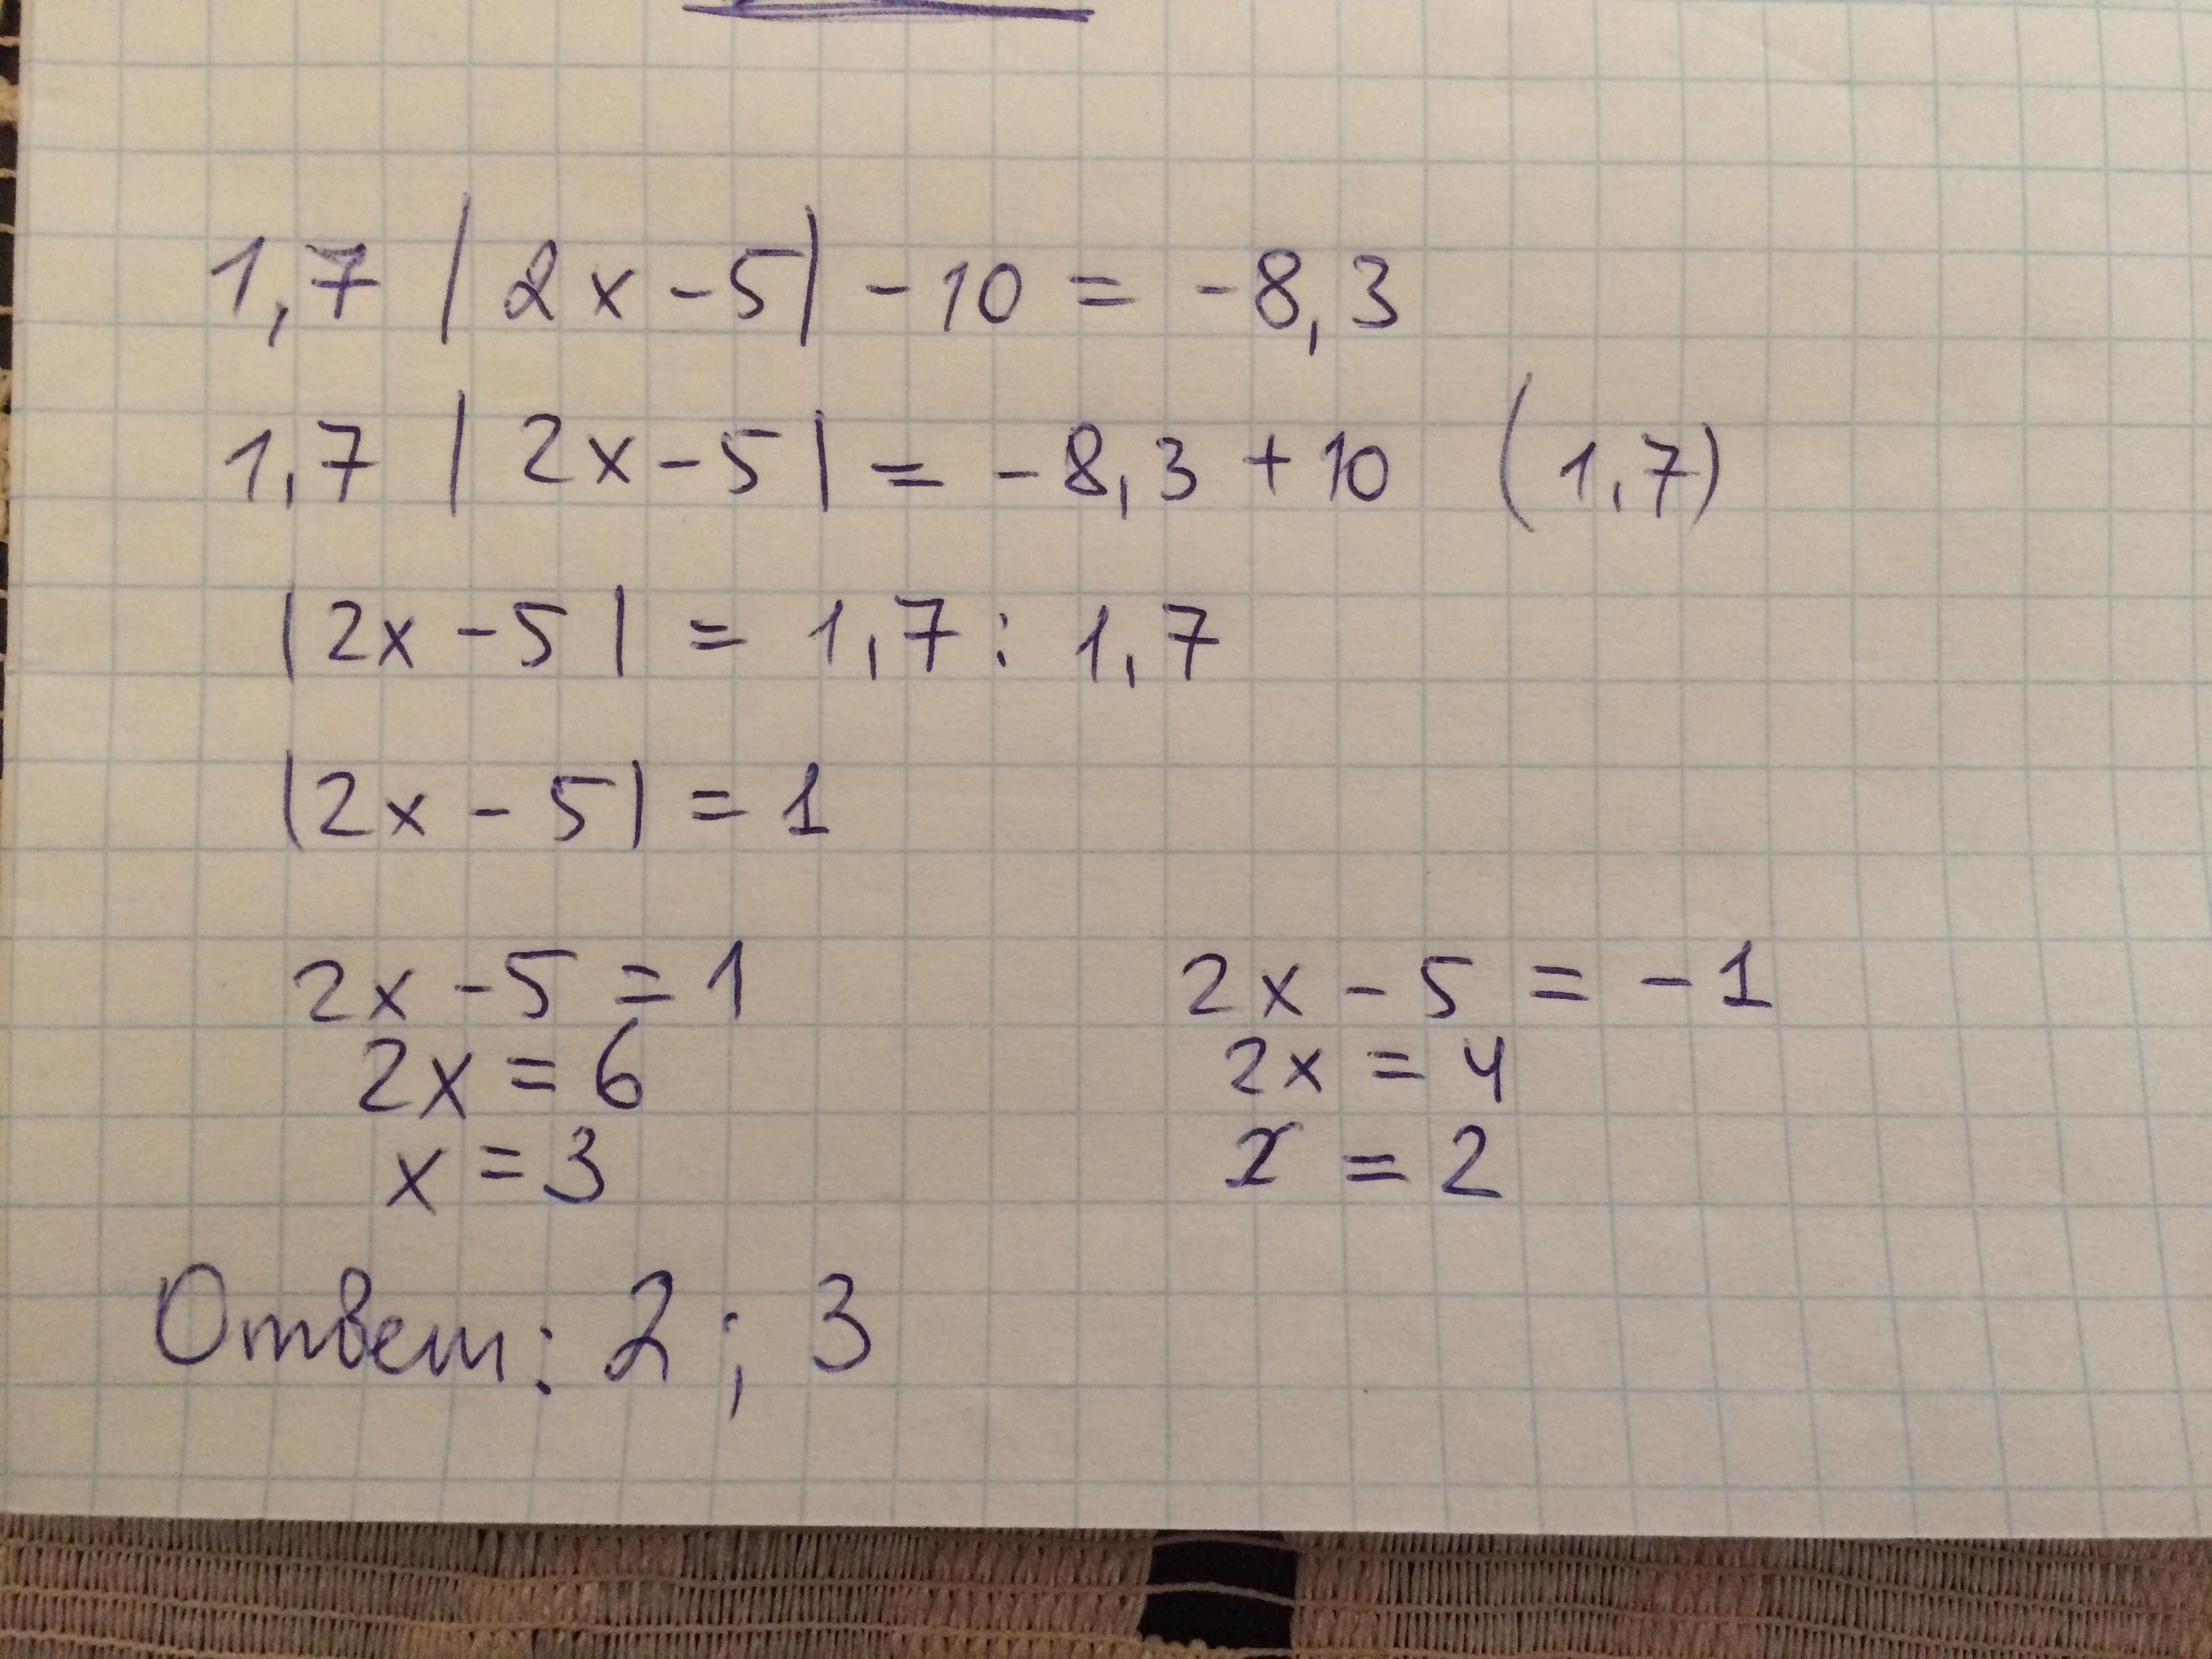 Решите уравнение 1,7|2х-5 |-10=-8,3